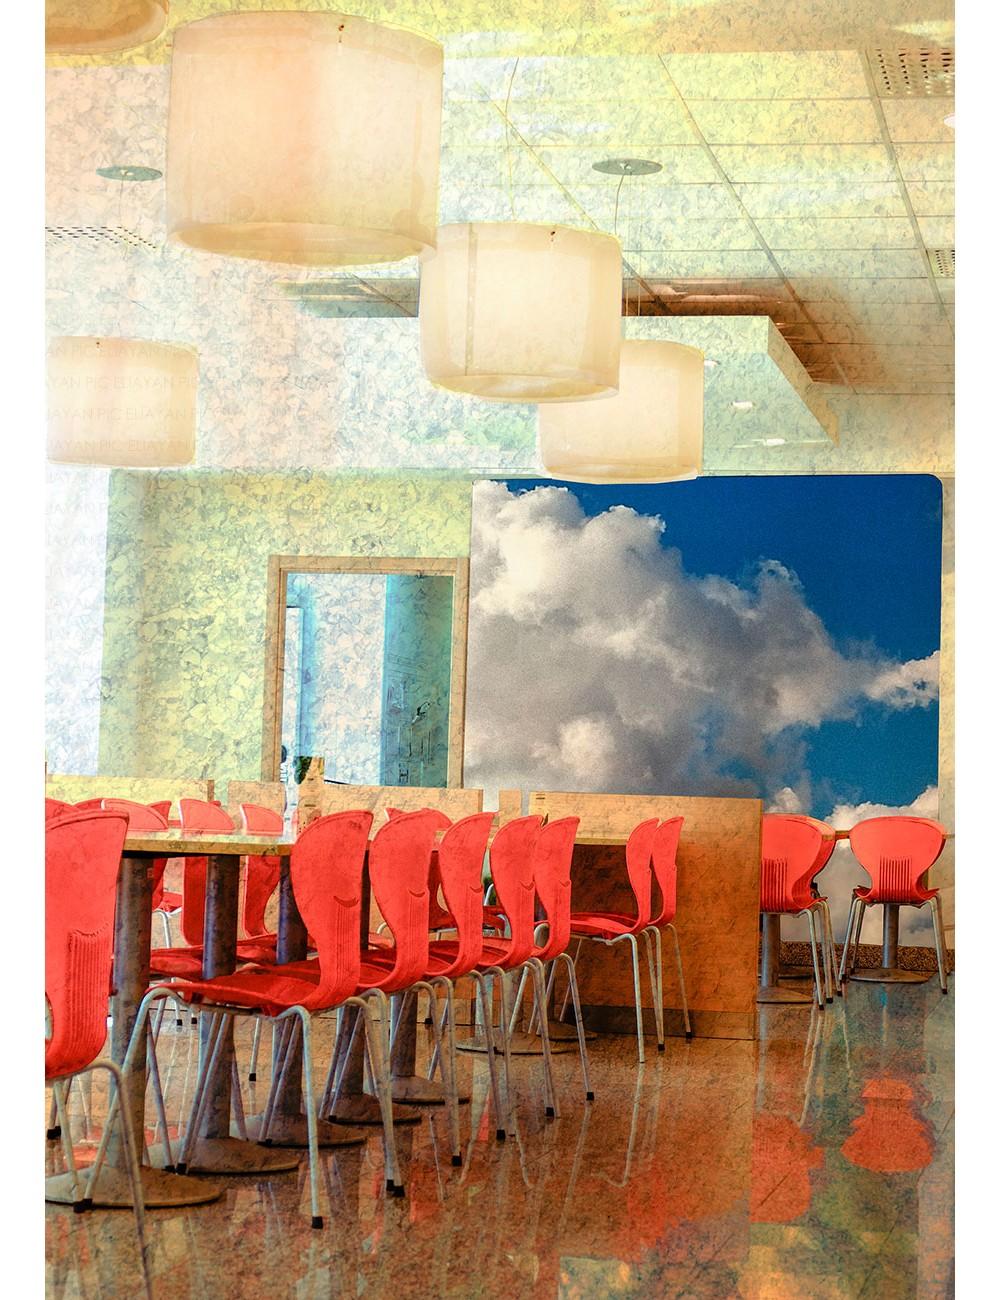 Étrange cafète d'Anne Eliayan & Christian Pic